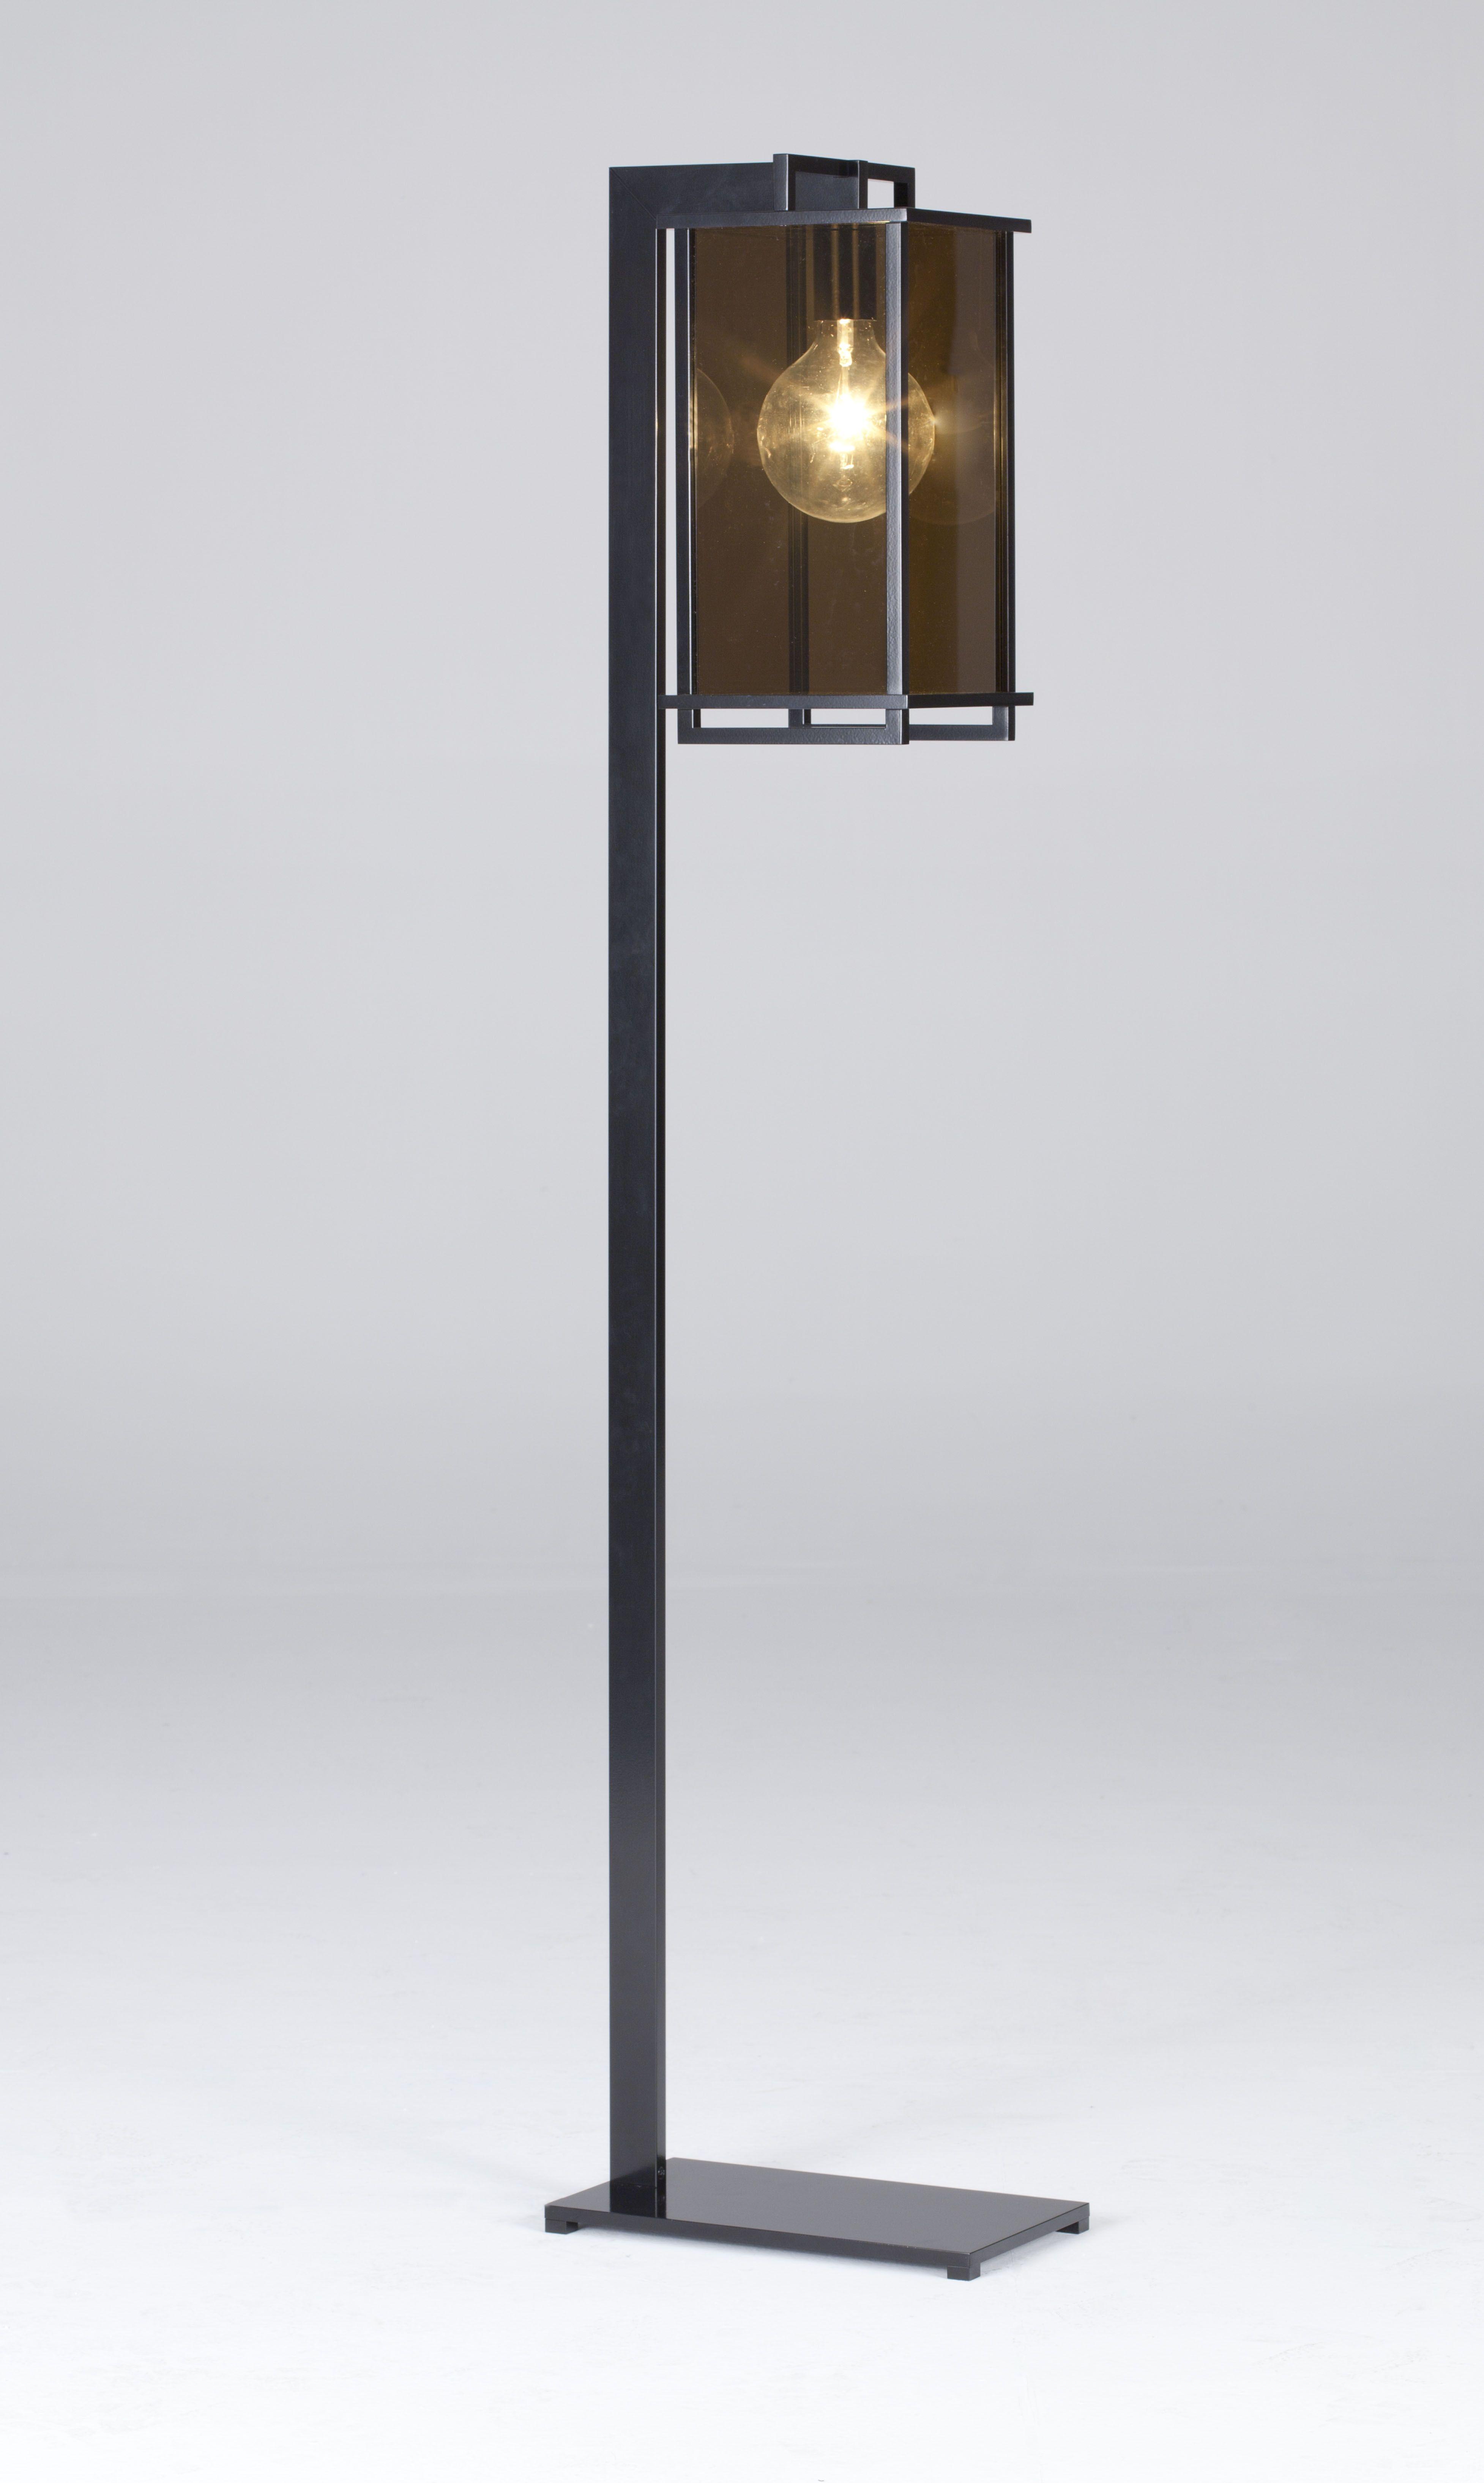 Ikon Lantern Whit Support Rod Black Lacquered Light